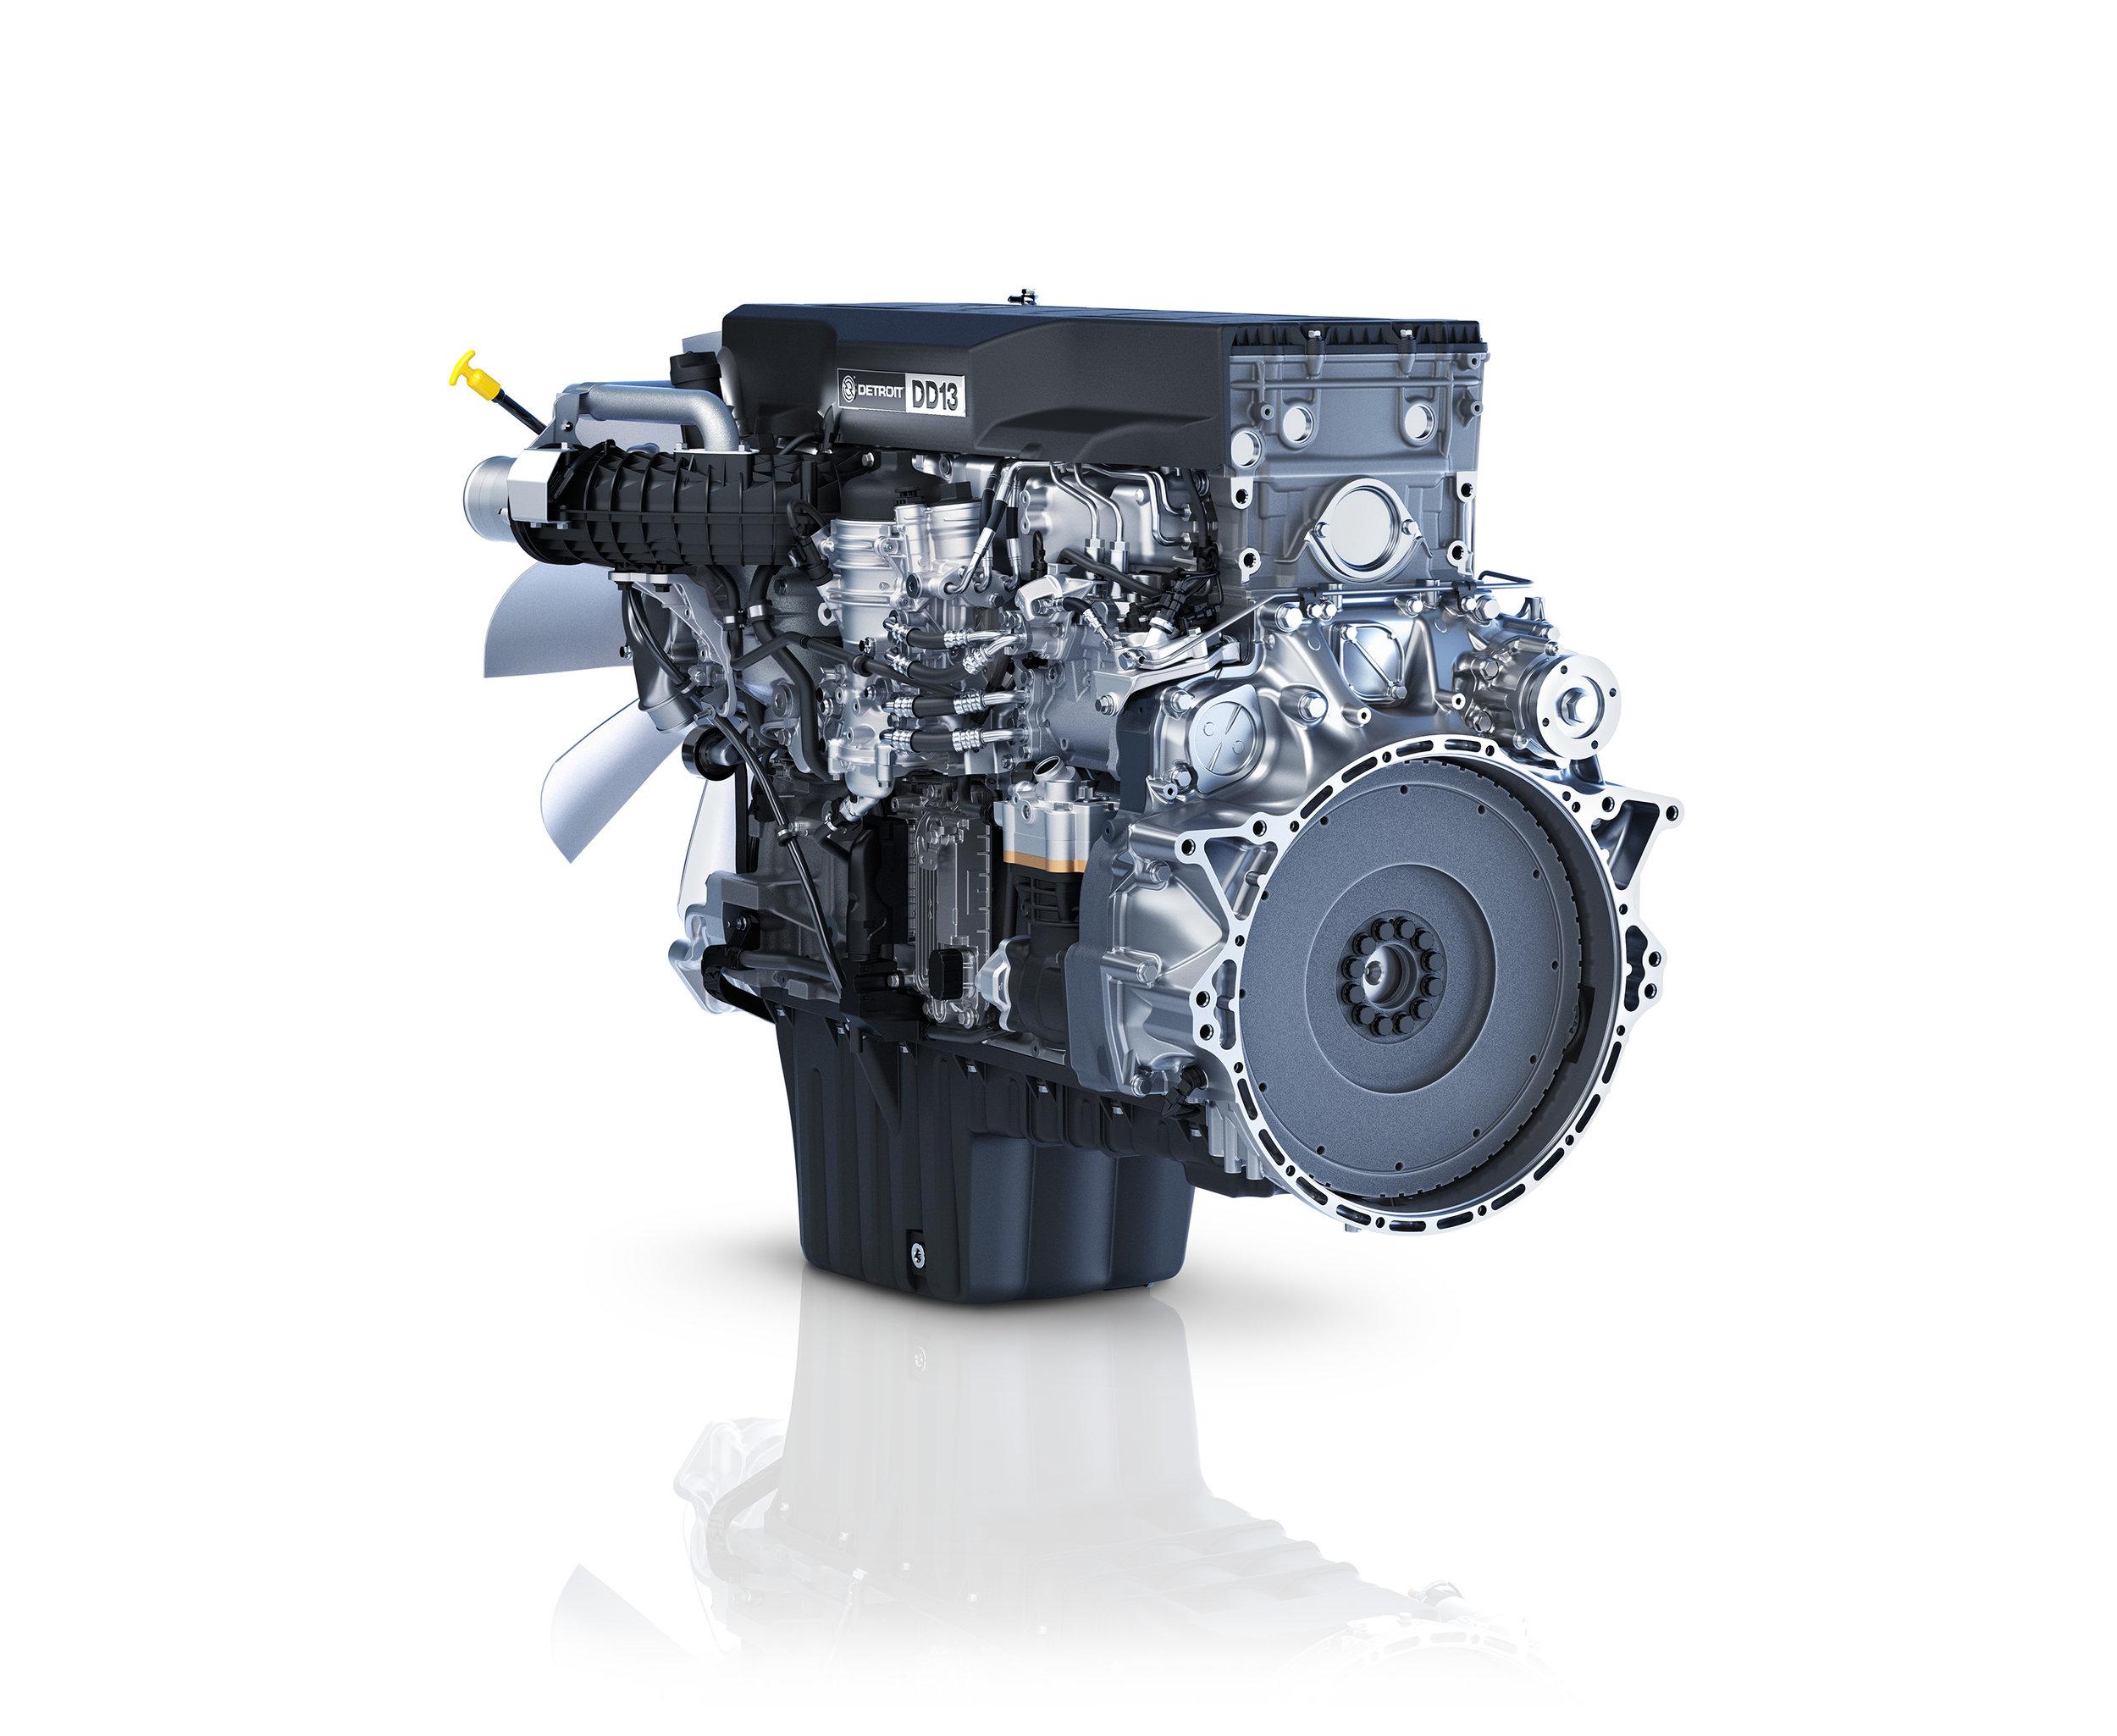 Engine_DD13_02_R34_ColdSide_Repto_v04.0000_V1_FPO.jpg